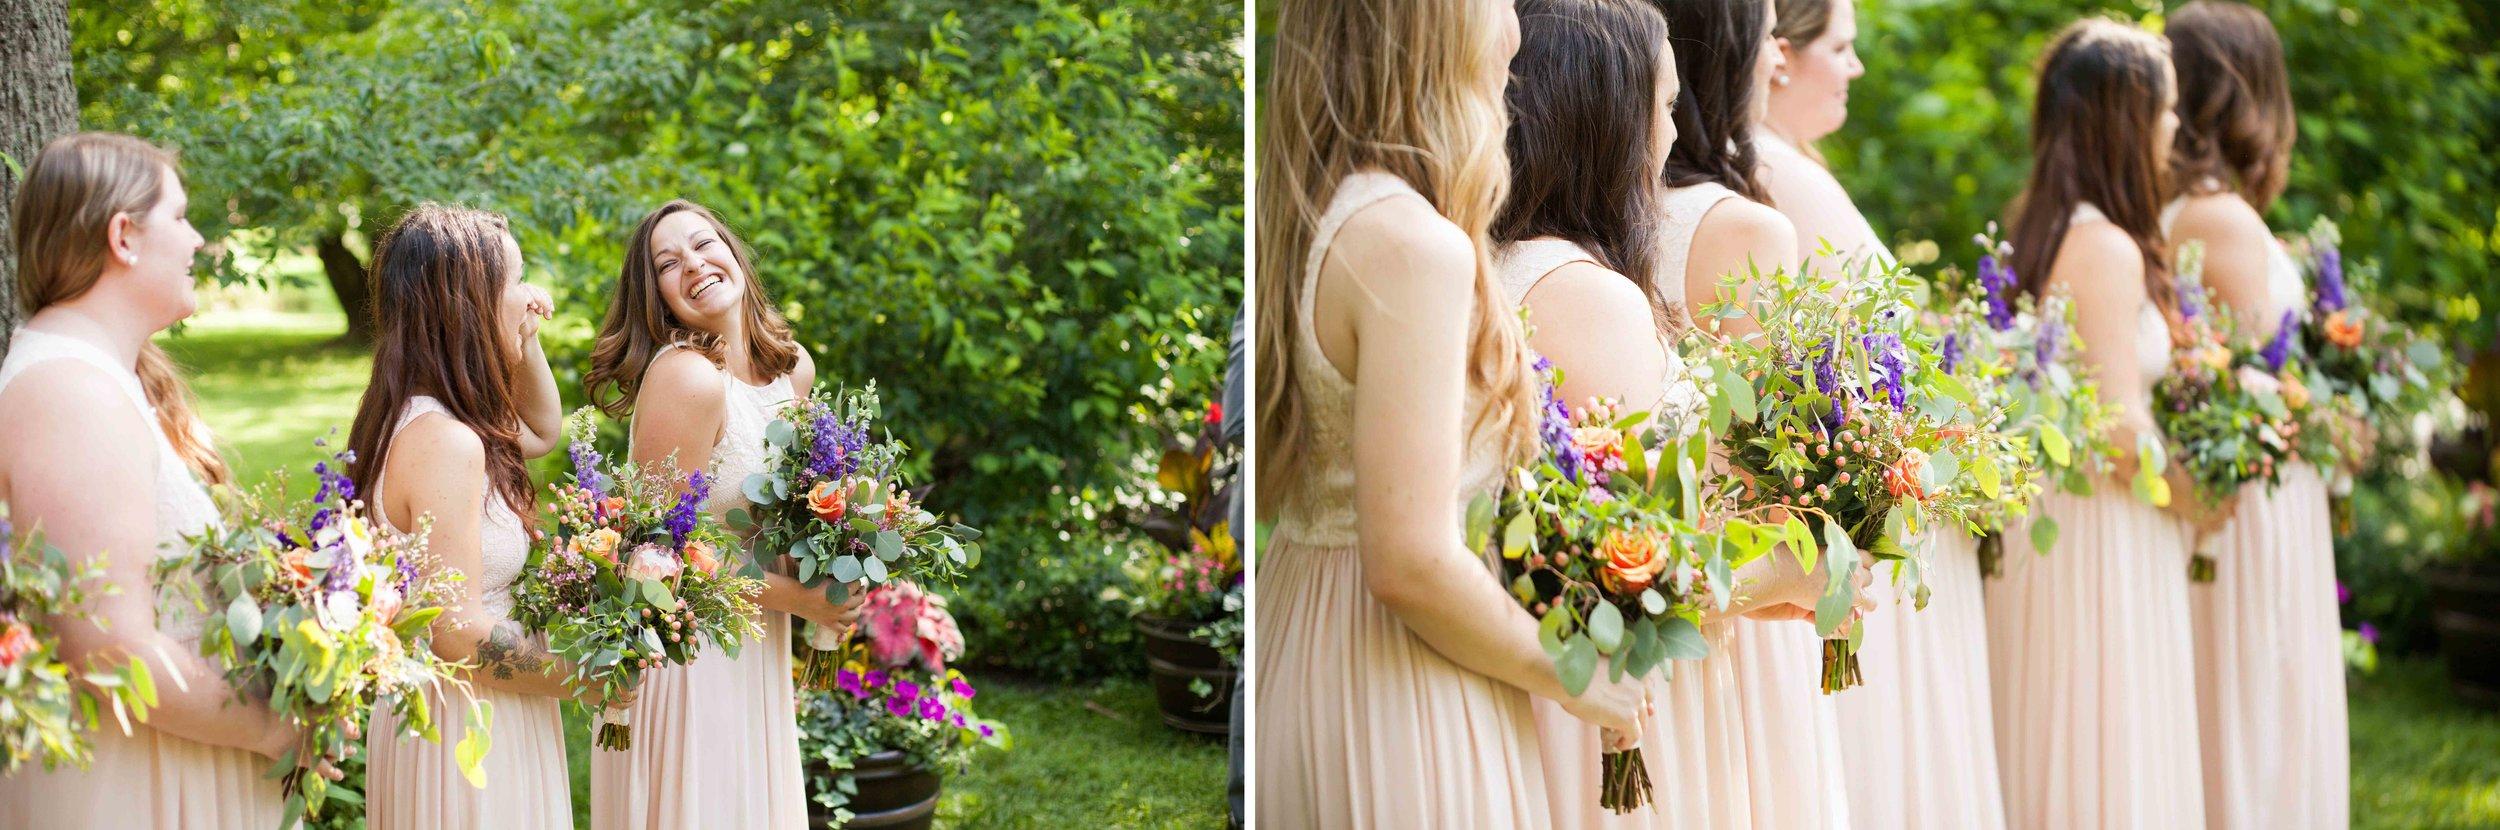 dd cincinnati wedding photographer ceremony0008.jpg